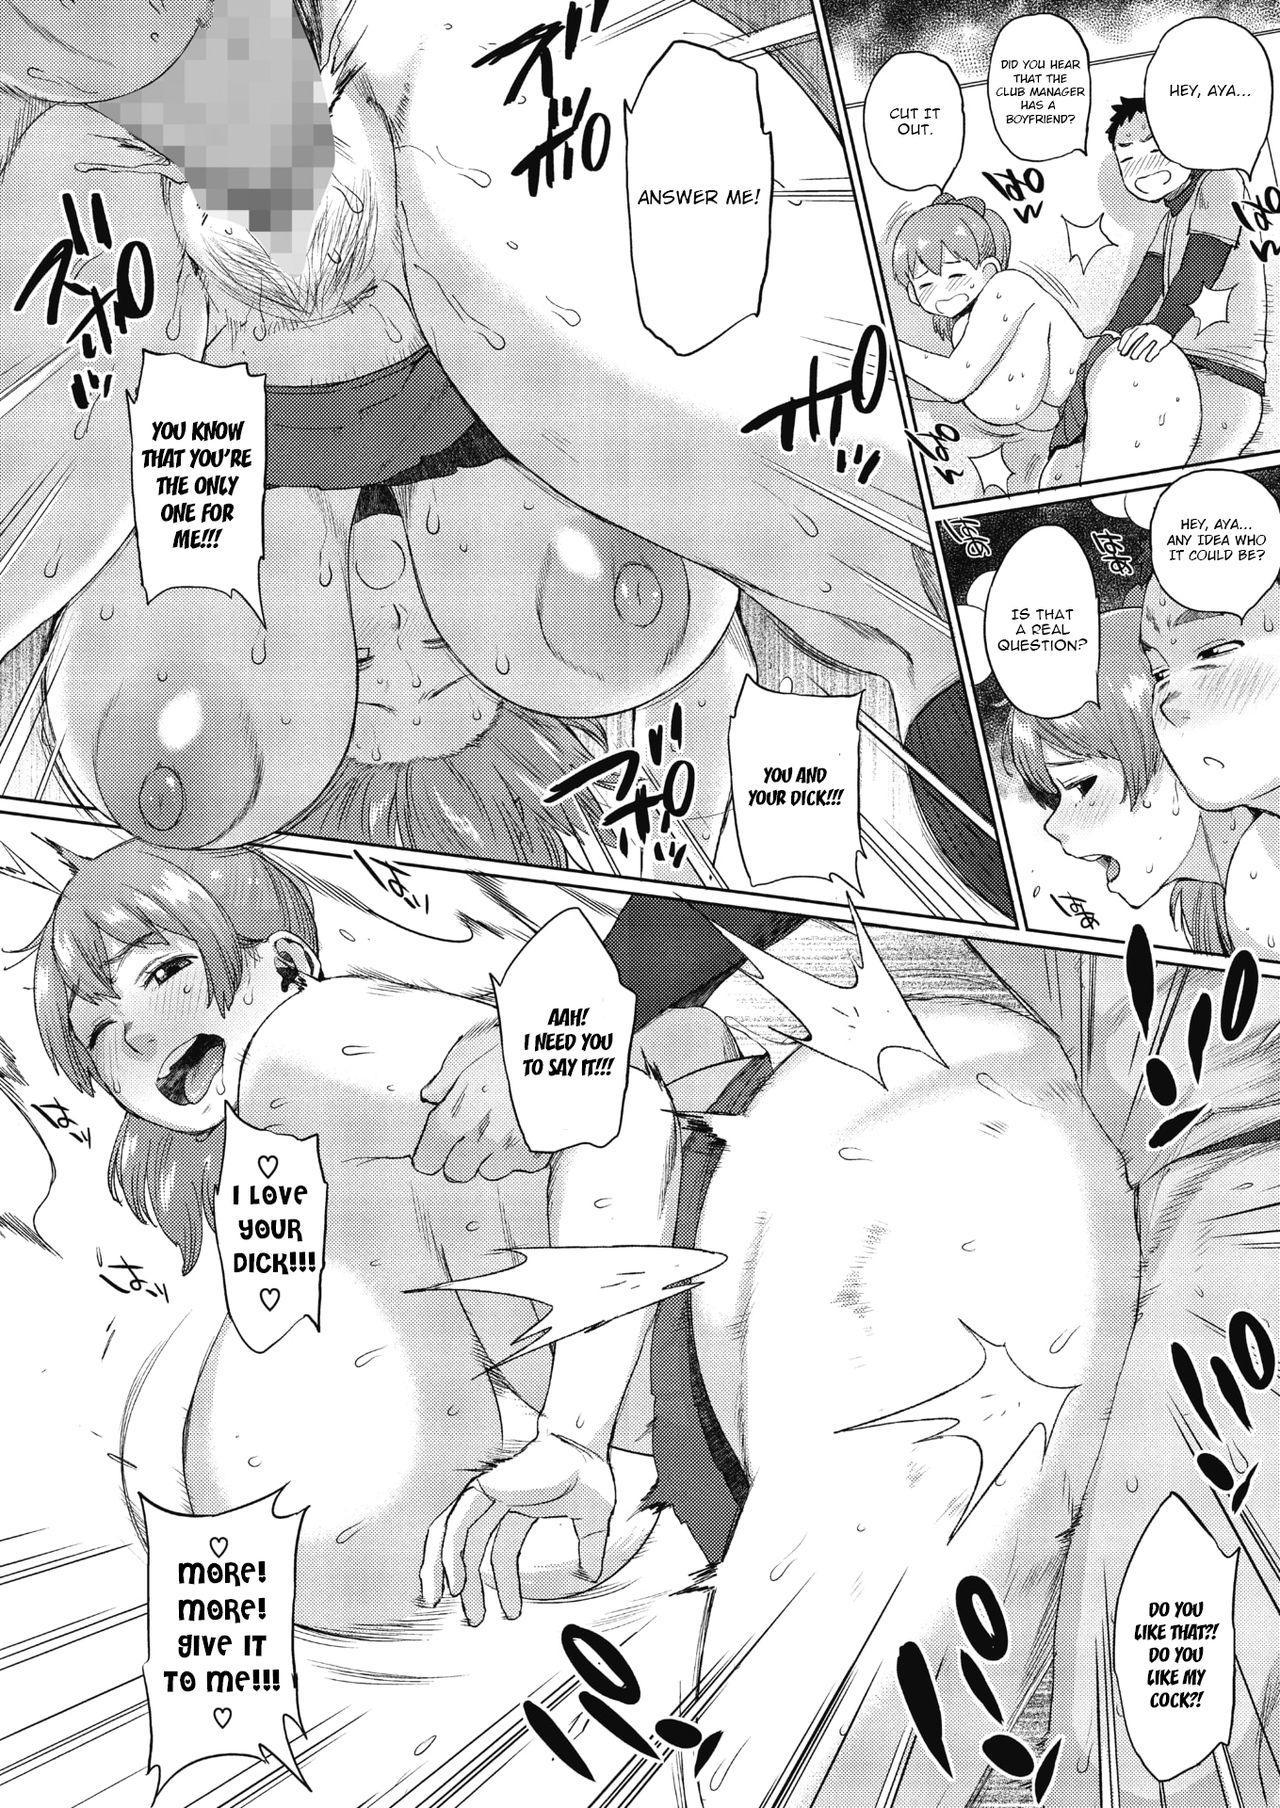 Senpai! Renshū yori honbanssu ♥ | Senpai! From Practice to Action ♥ 17